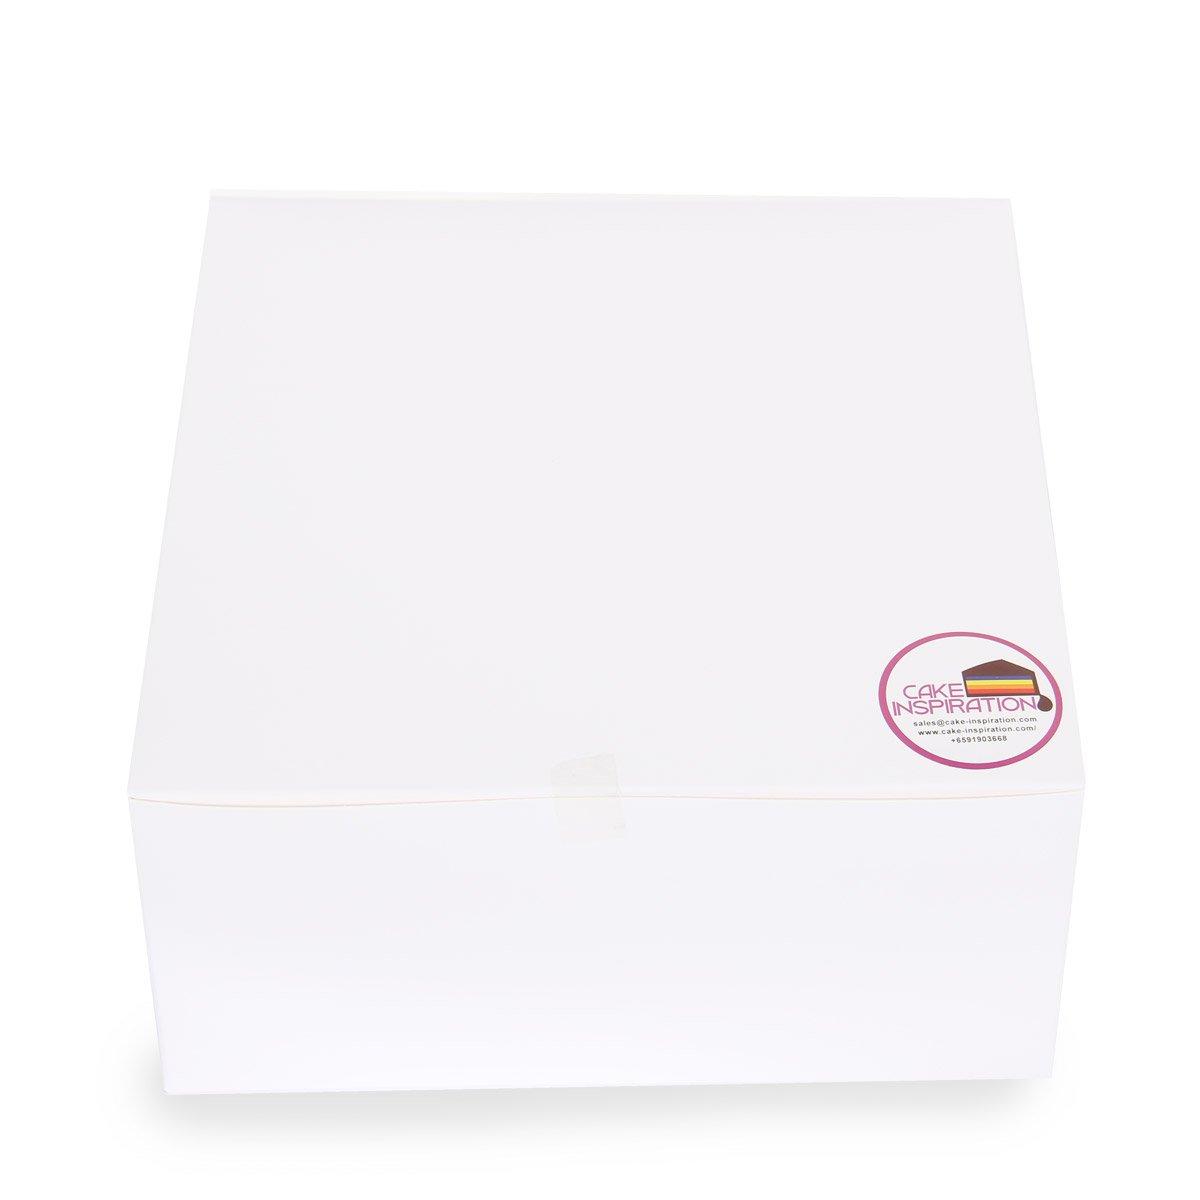 Cake-Inspiration-Box_1200